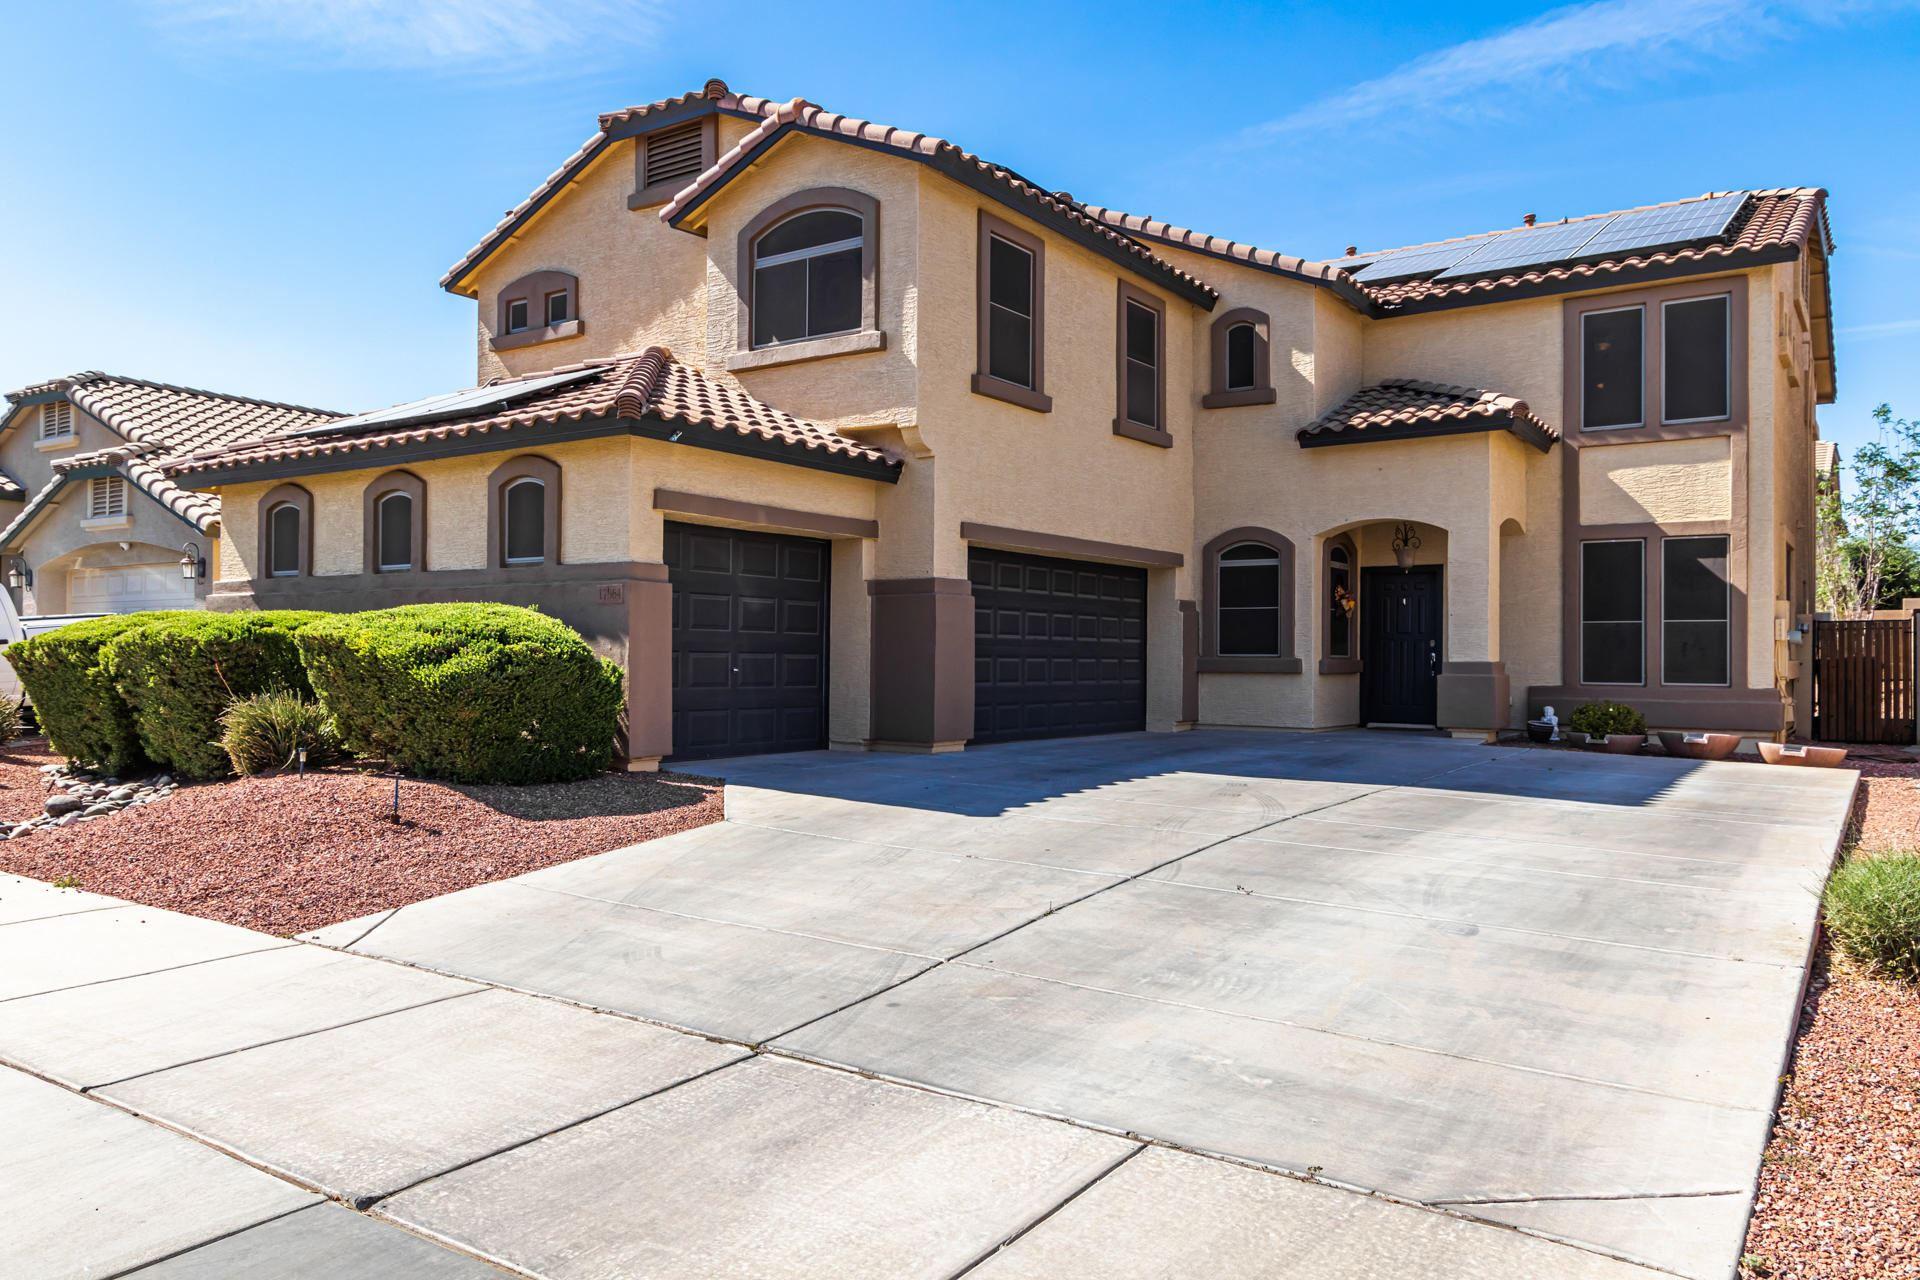 Photo of 17864 W ANDORA Street, Surprise, AZ 85388 (MLS # 6226111)